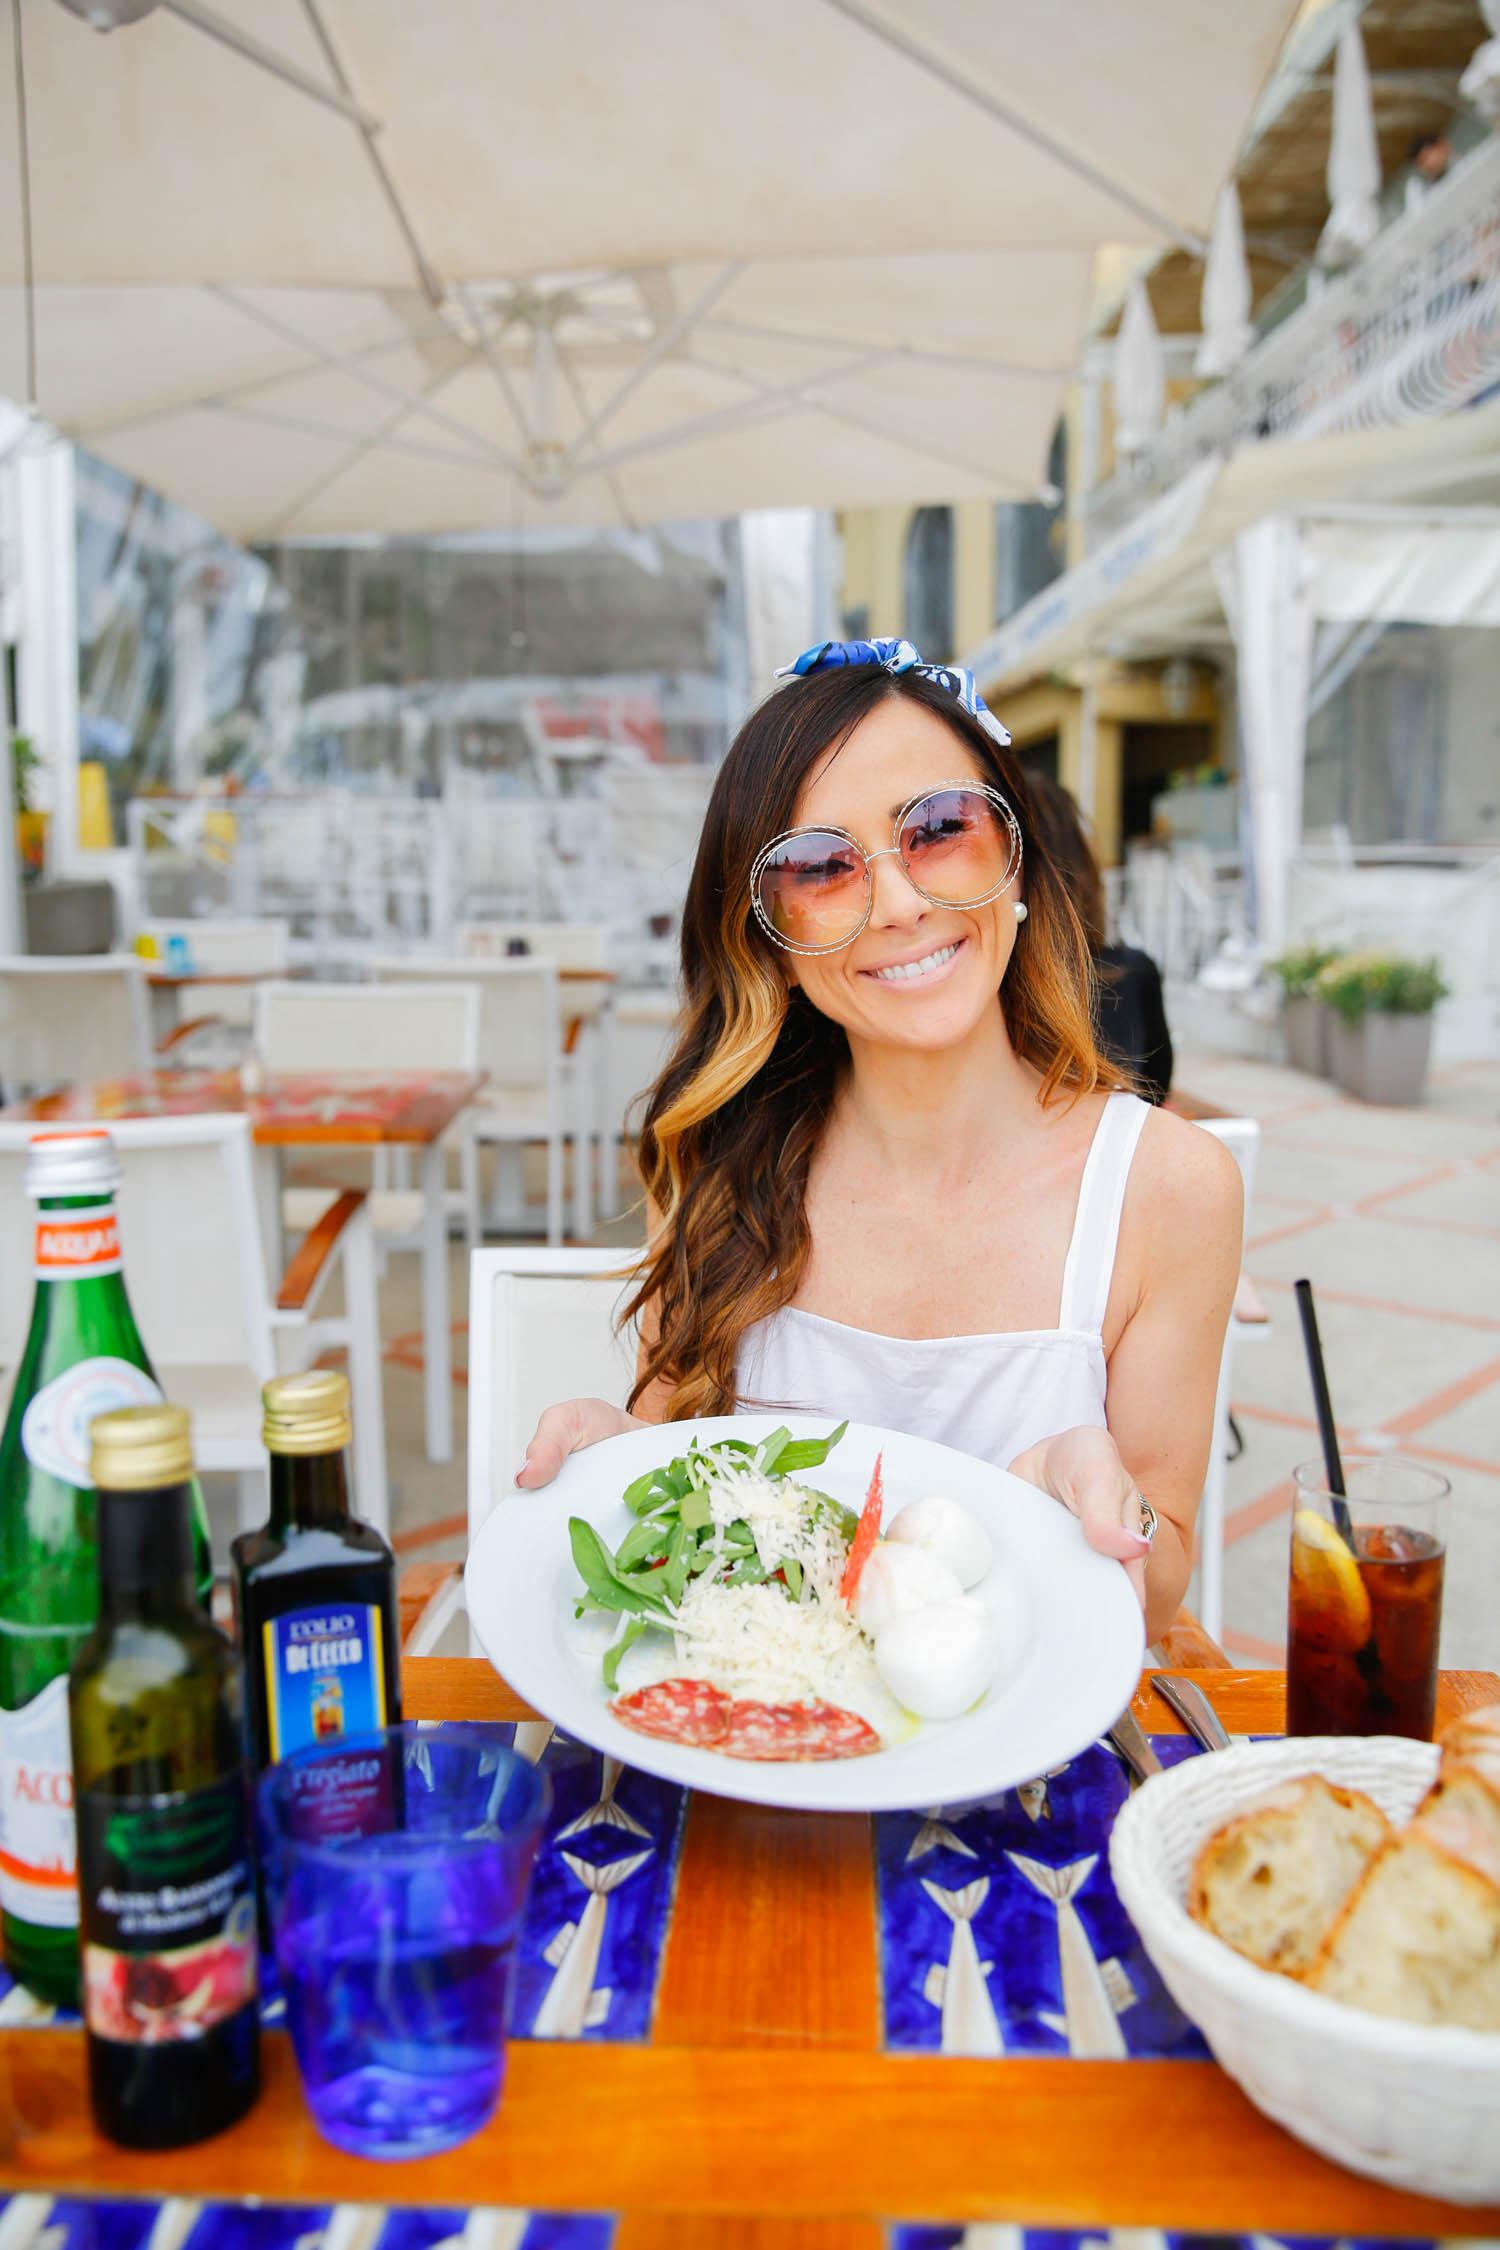 positano, positano restaurants, where to eat in positano